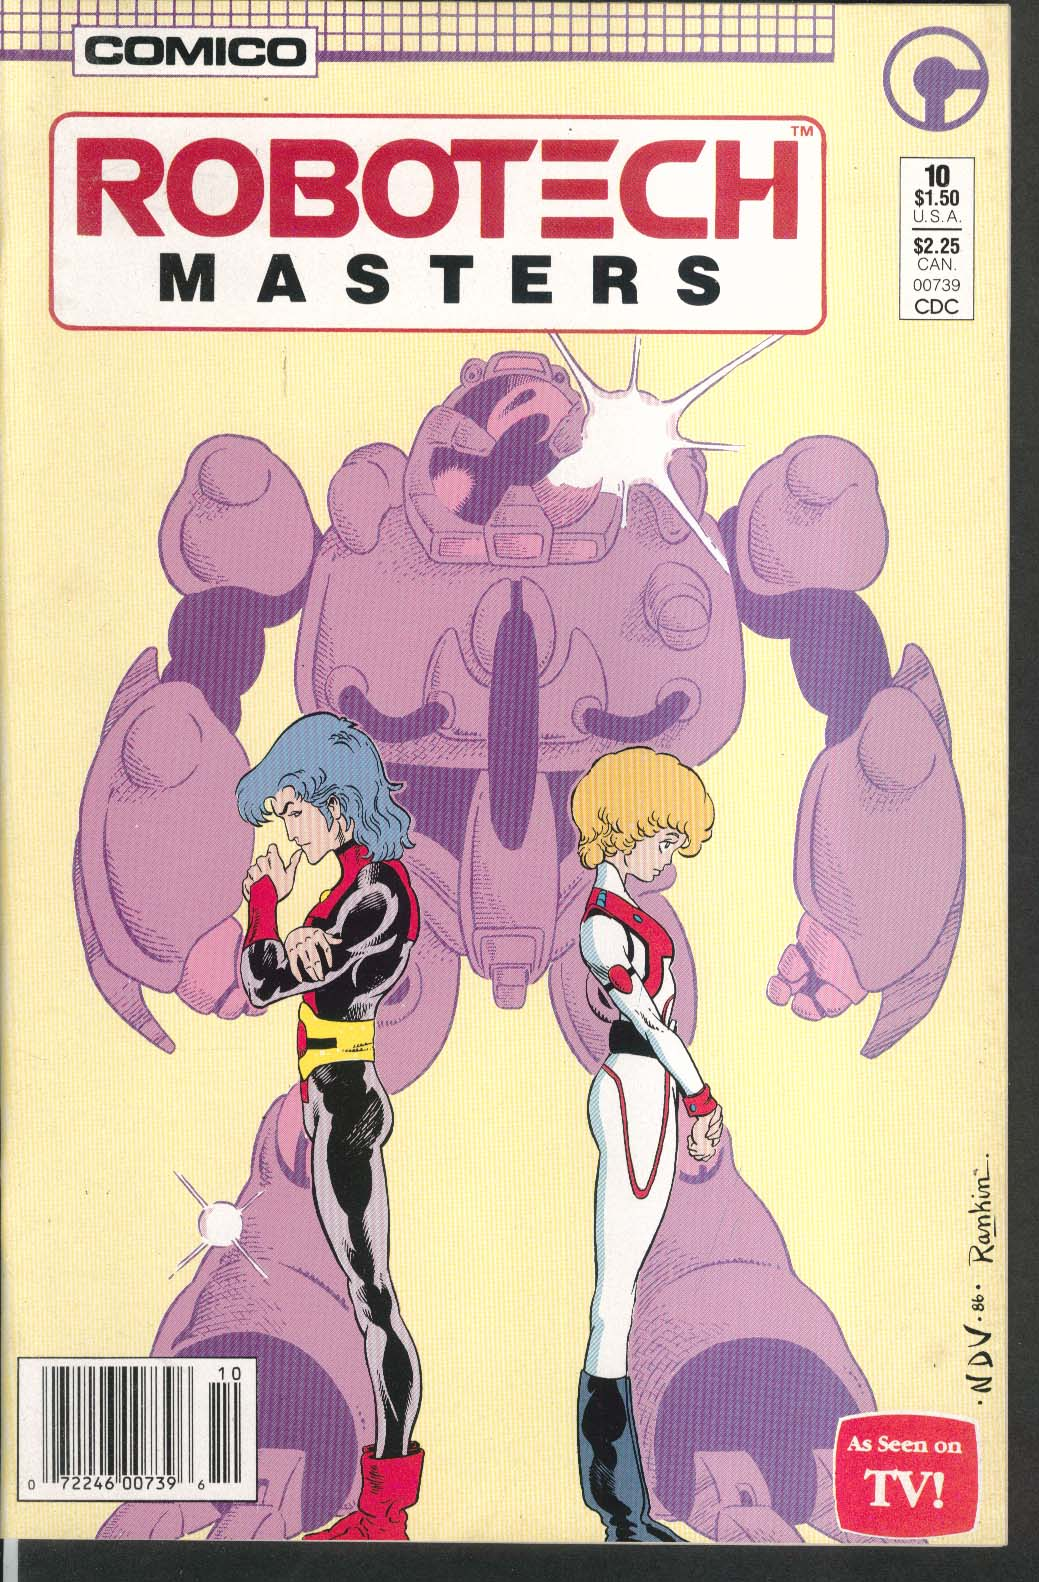 ROBOTECH Masters #10 Comico comic book 8 1986